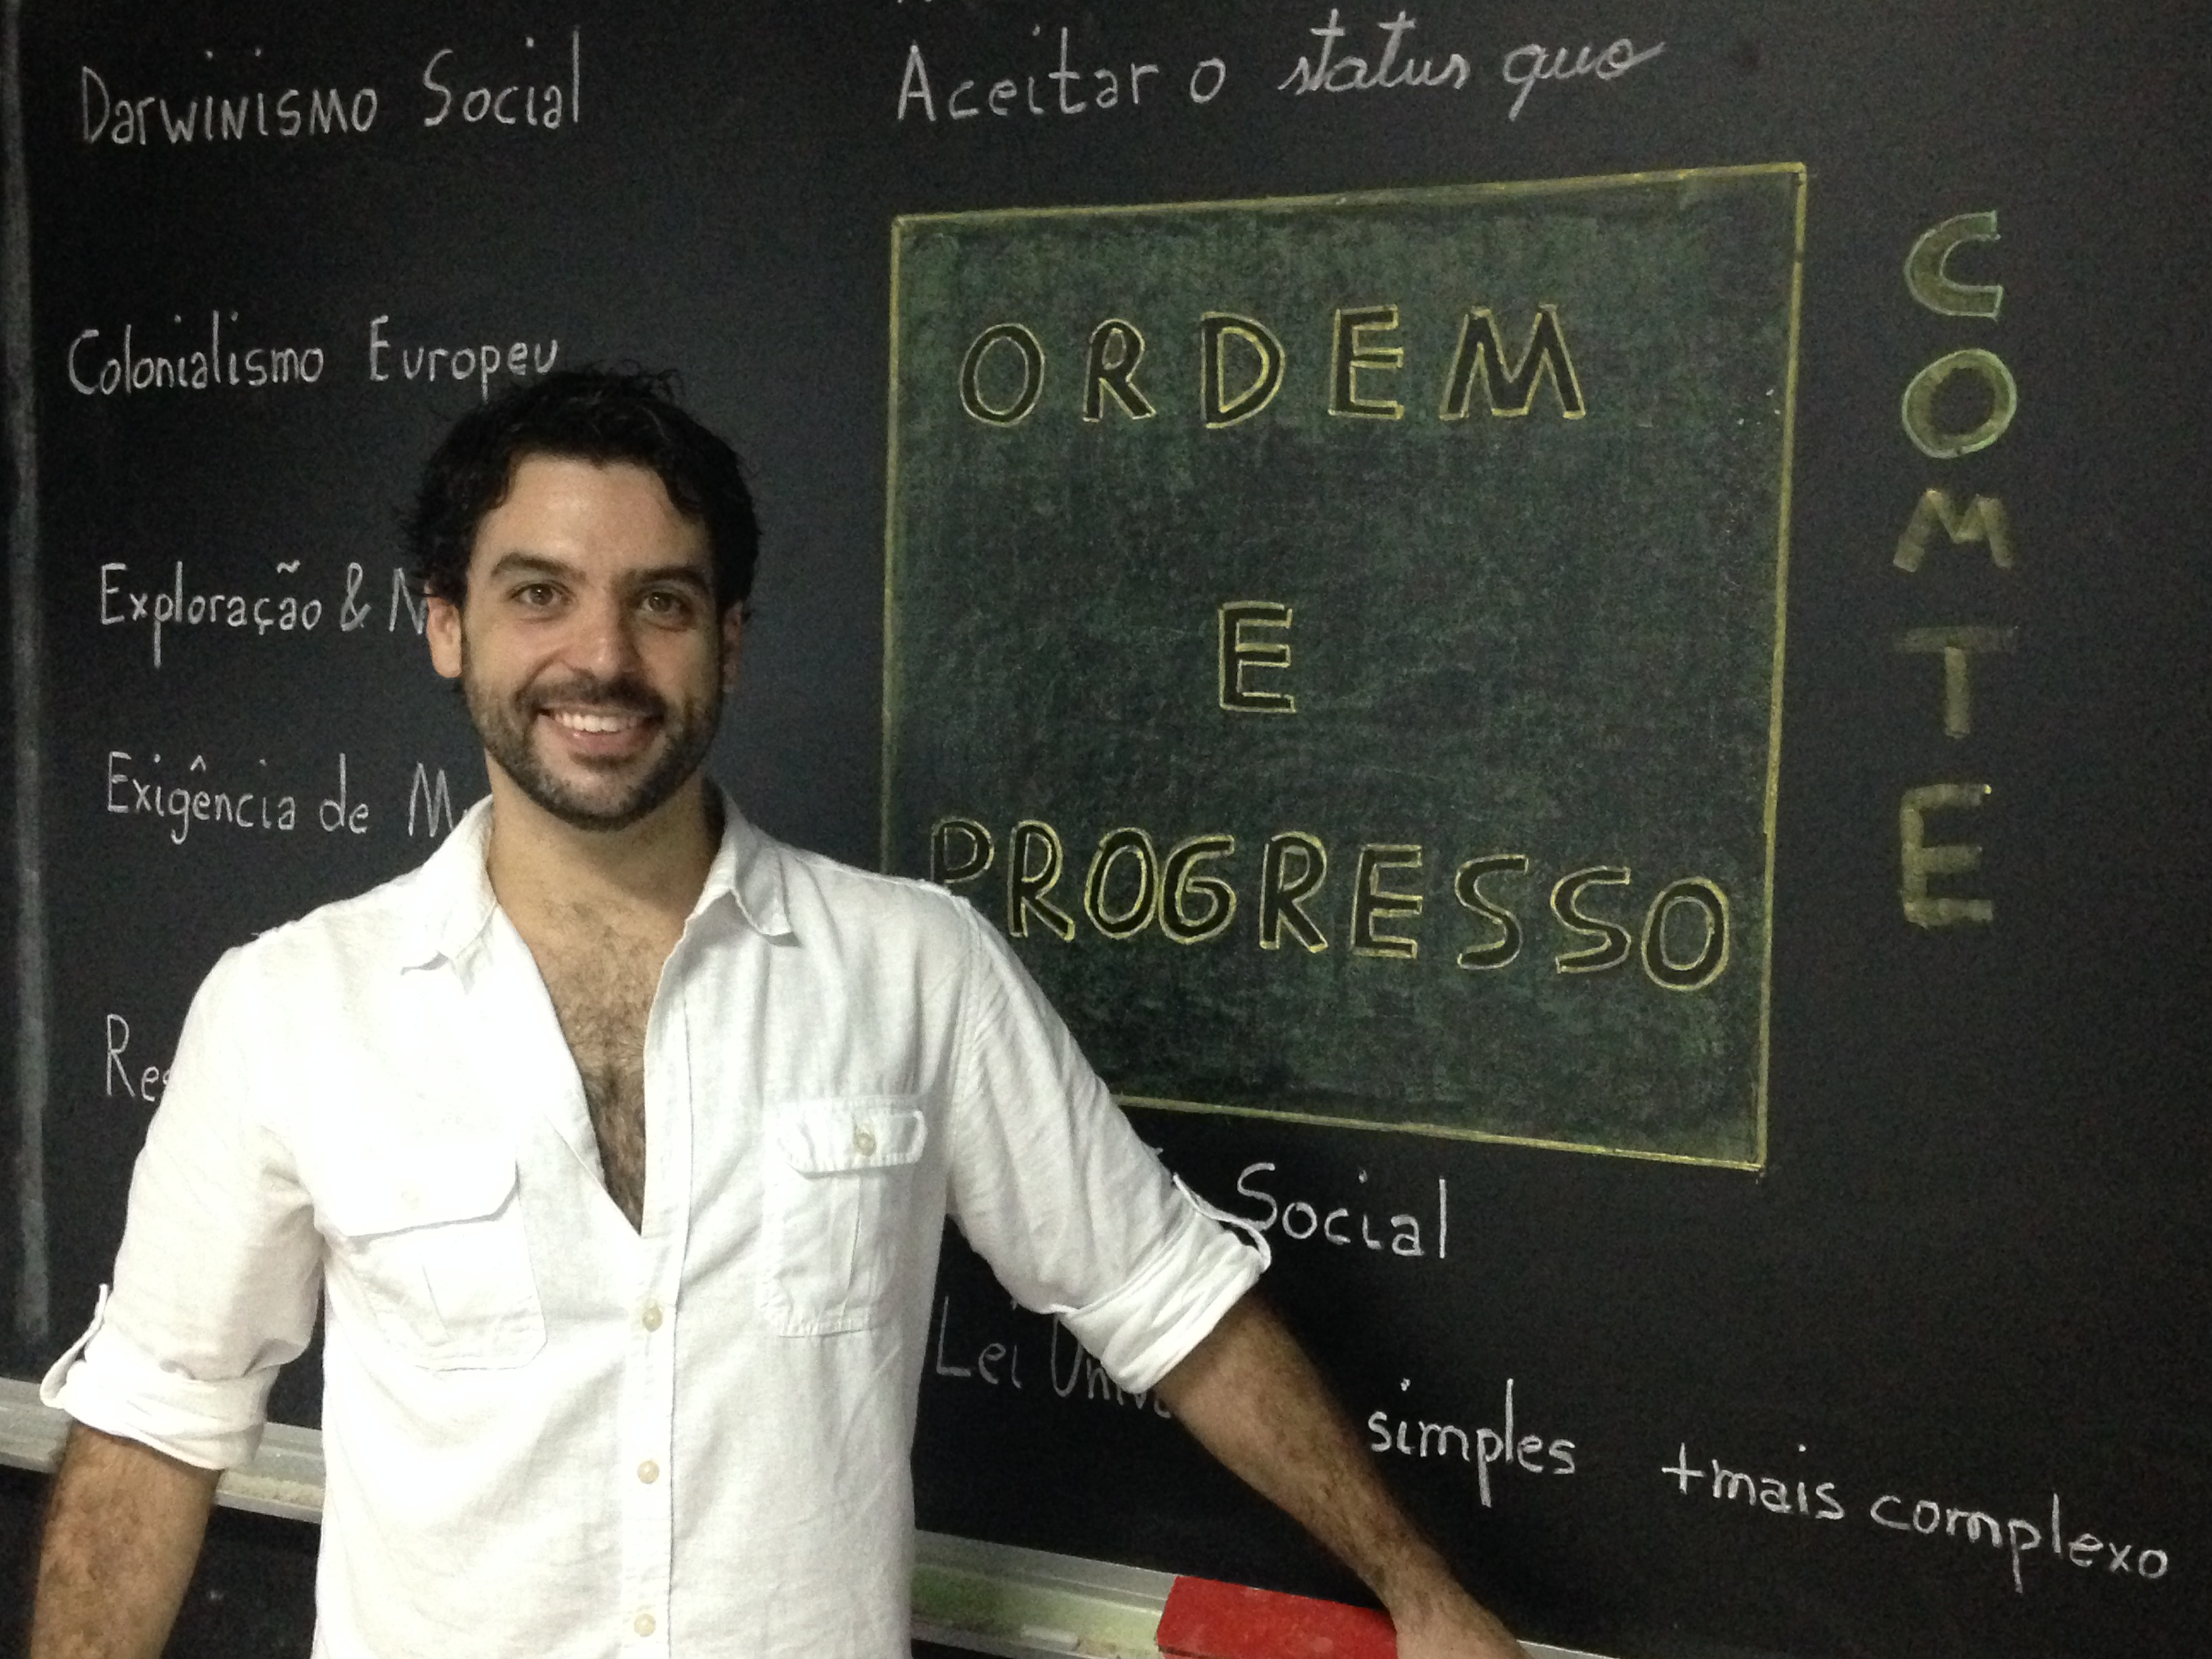 Professor Braian ensina como estudar sociologia